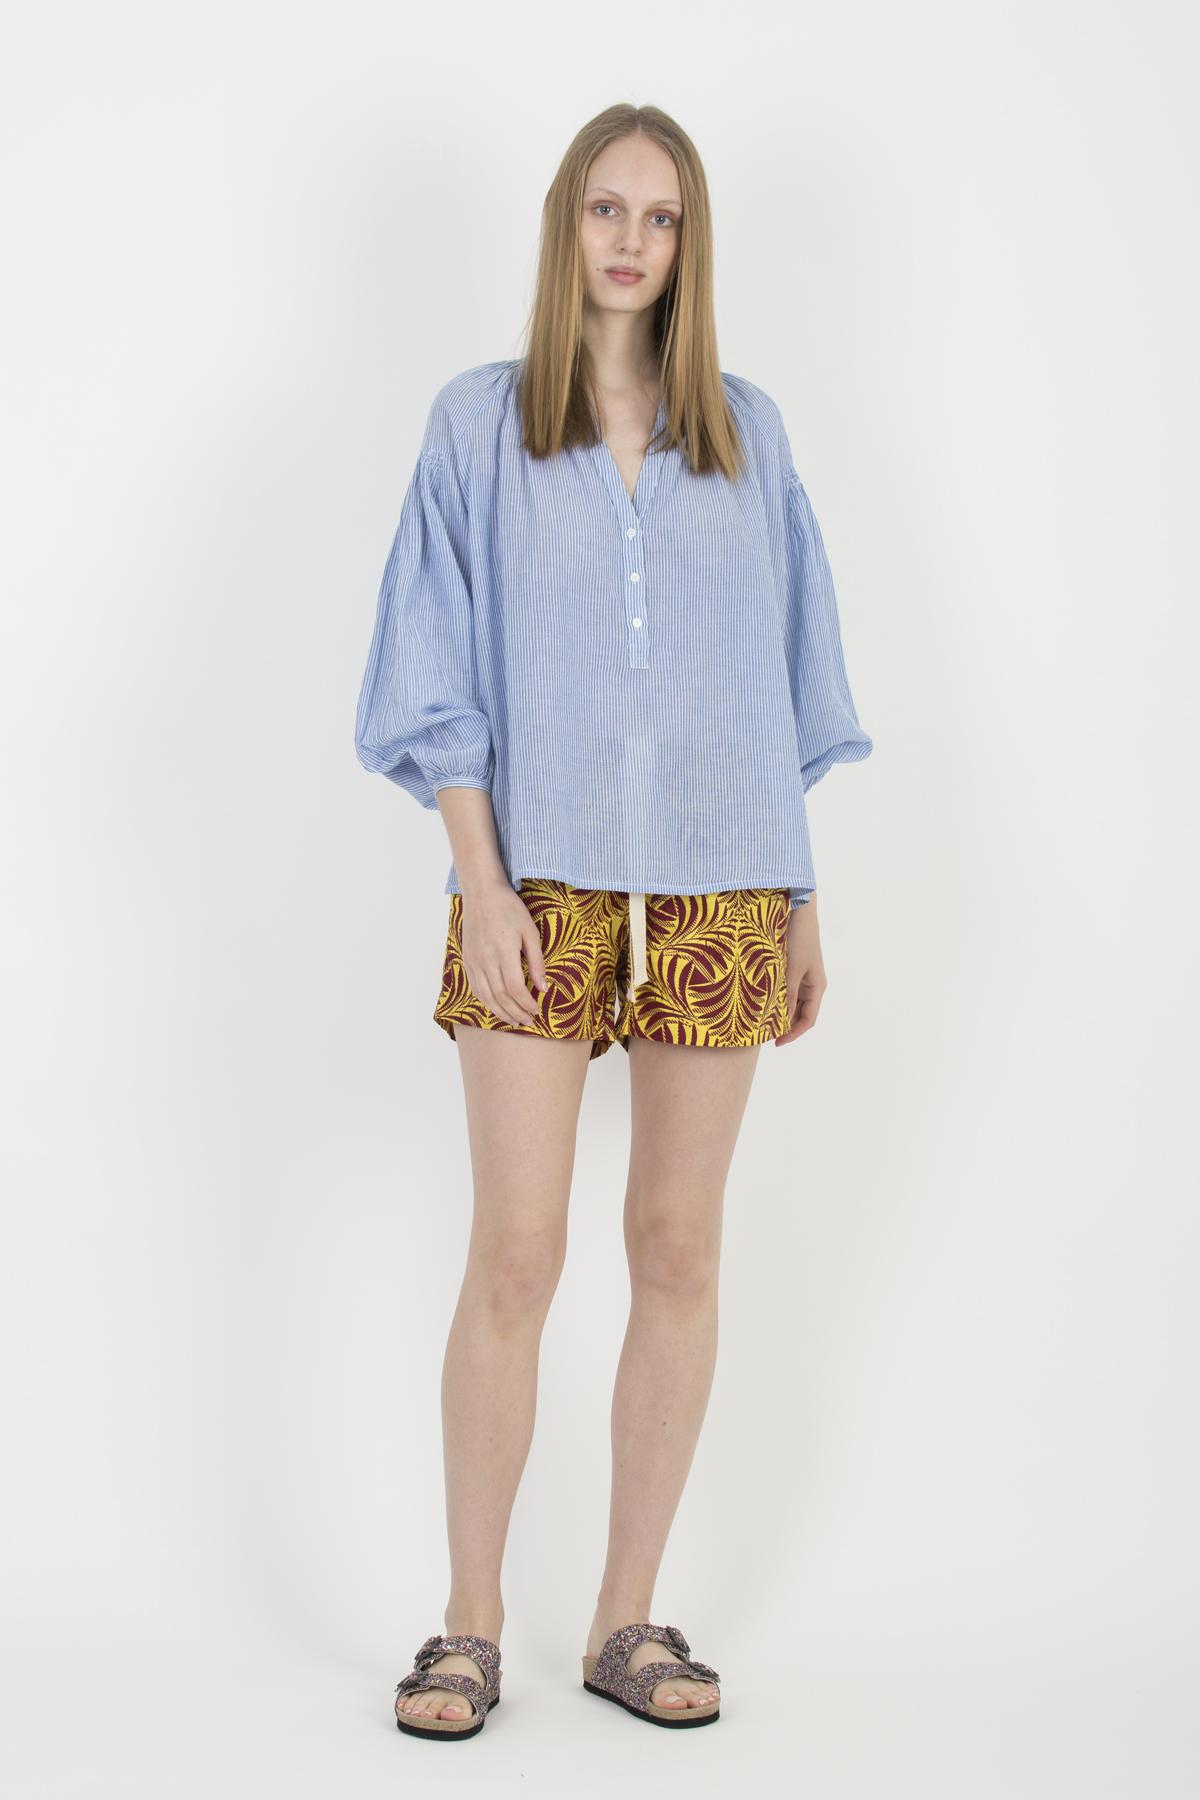 nipoa-vanessa-bruno-cotton-blouse-blue-matchboxathens